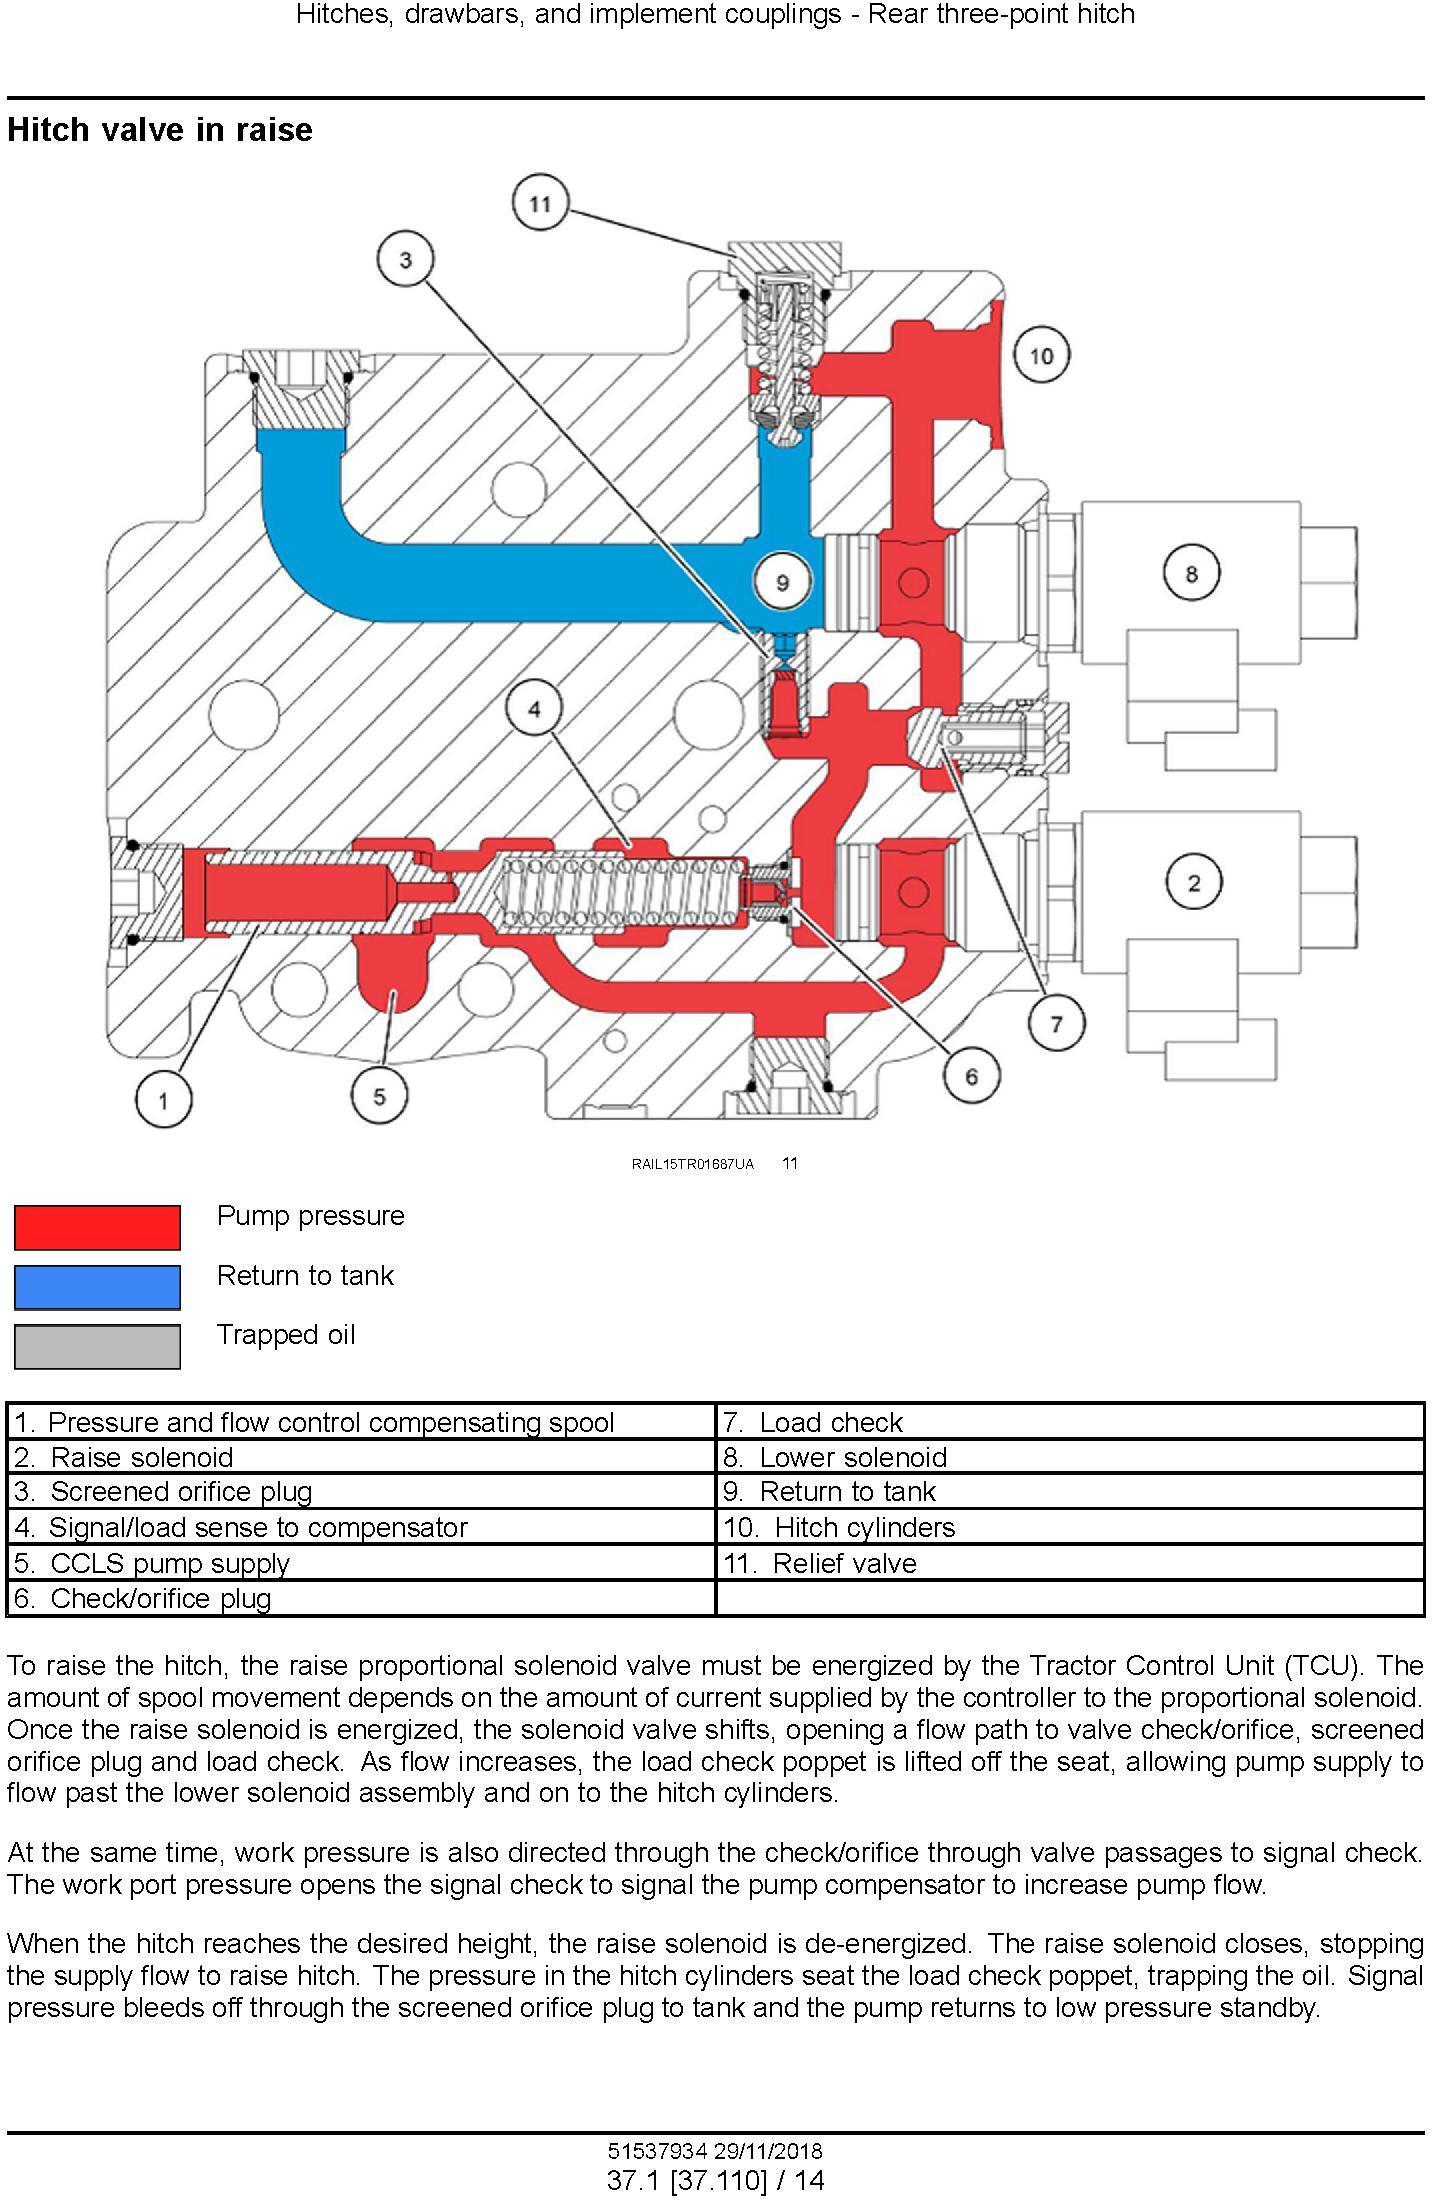 New Holland T8.320, T8.350, T8.380, T8.410, T8.435 and SmartTrax CVT TIER 4B Tractor Service Manual - 3